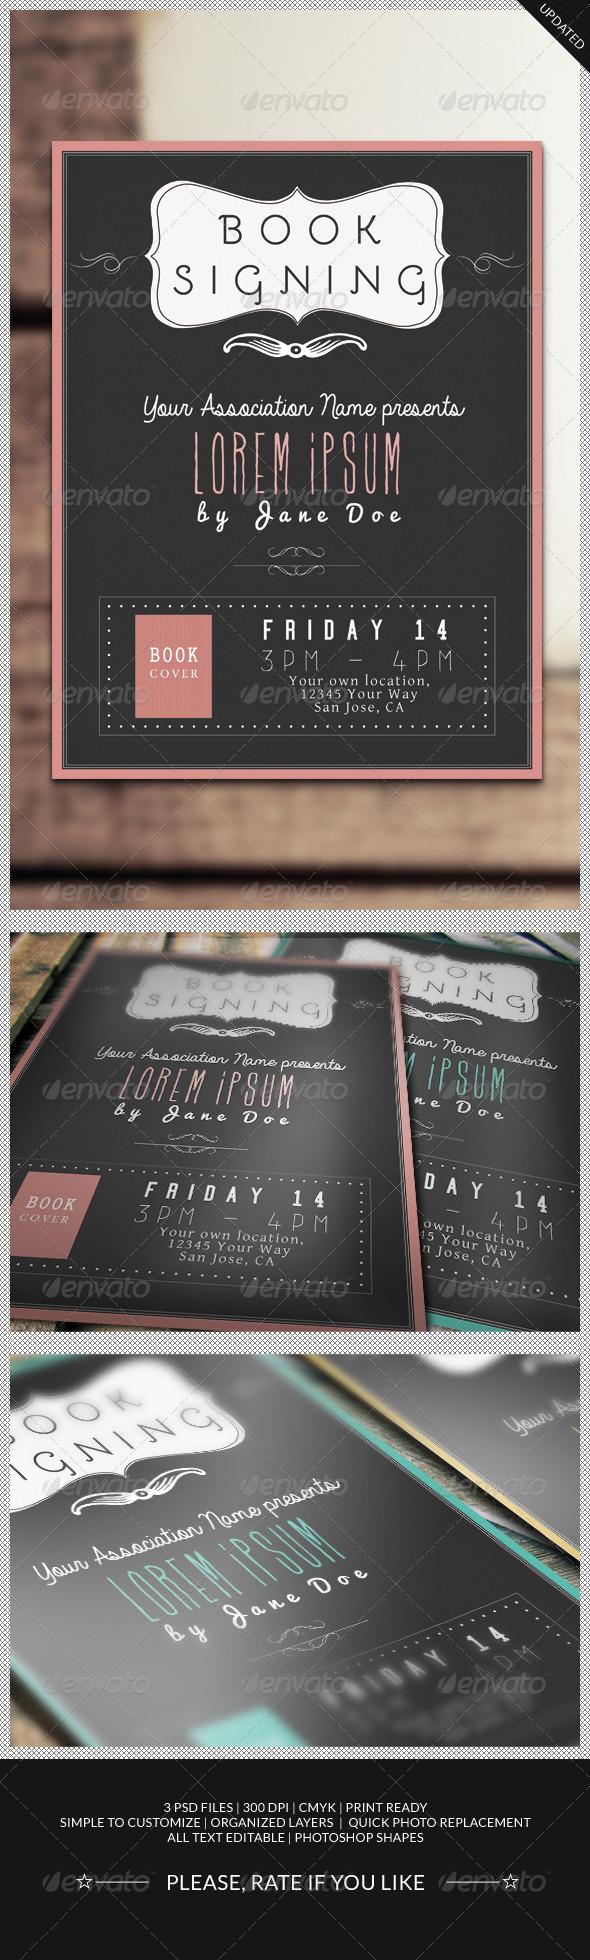 InDesign template. | InDesign | Pinterest | El diseño, Editorial y ...